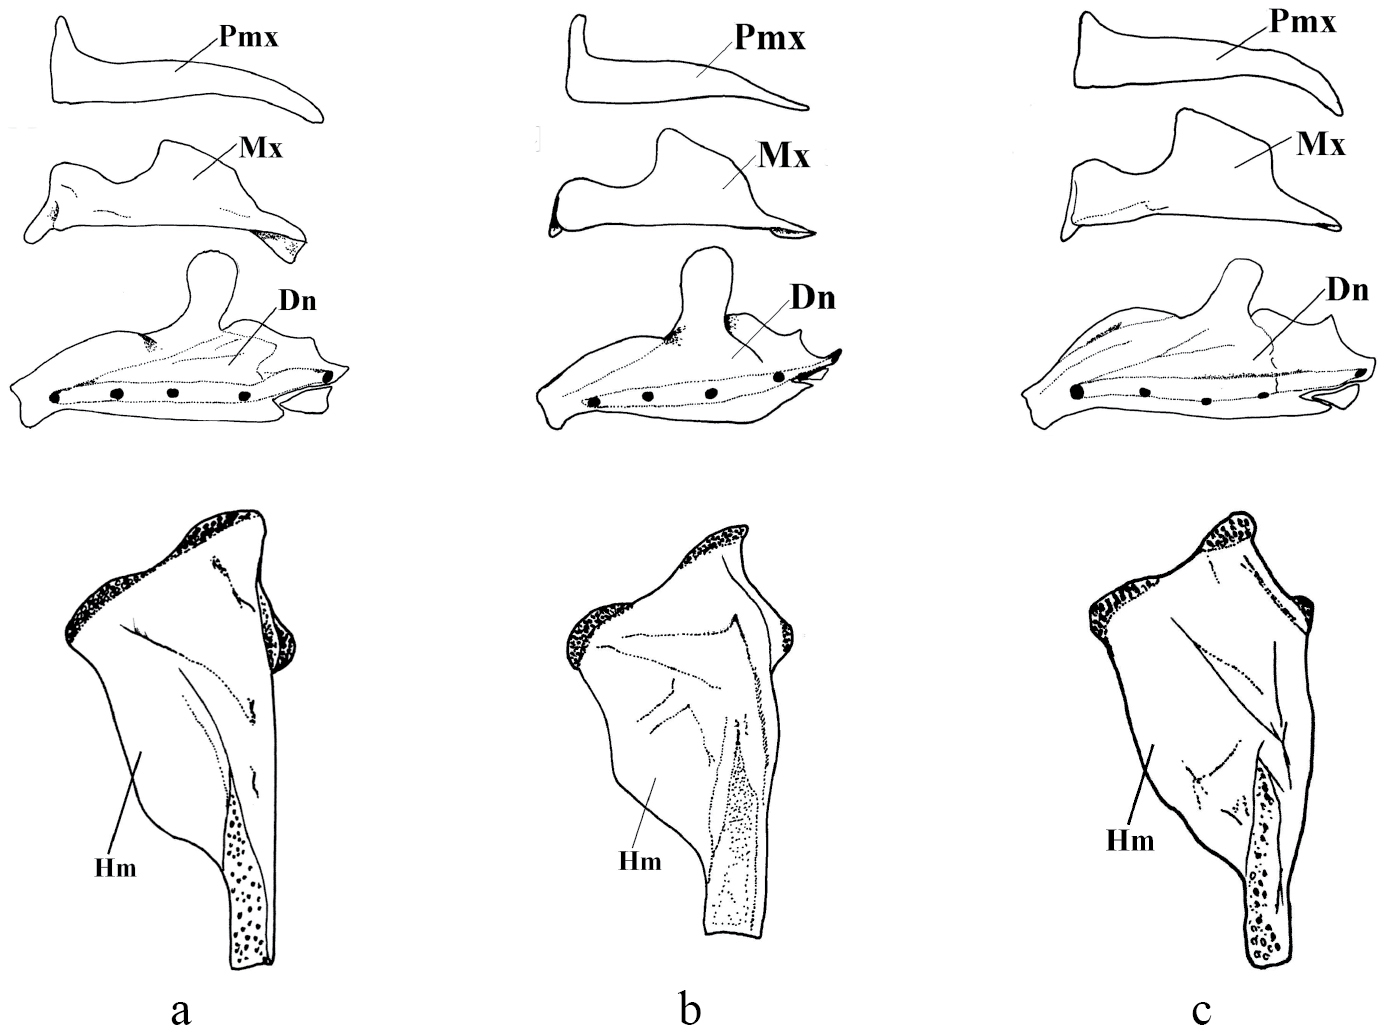 Hyomandibulare